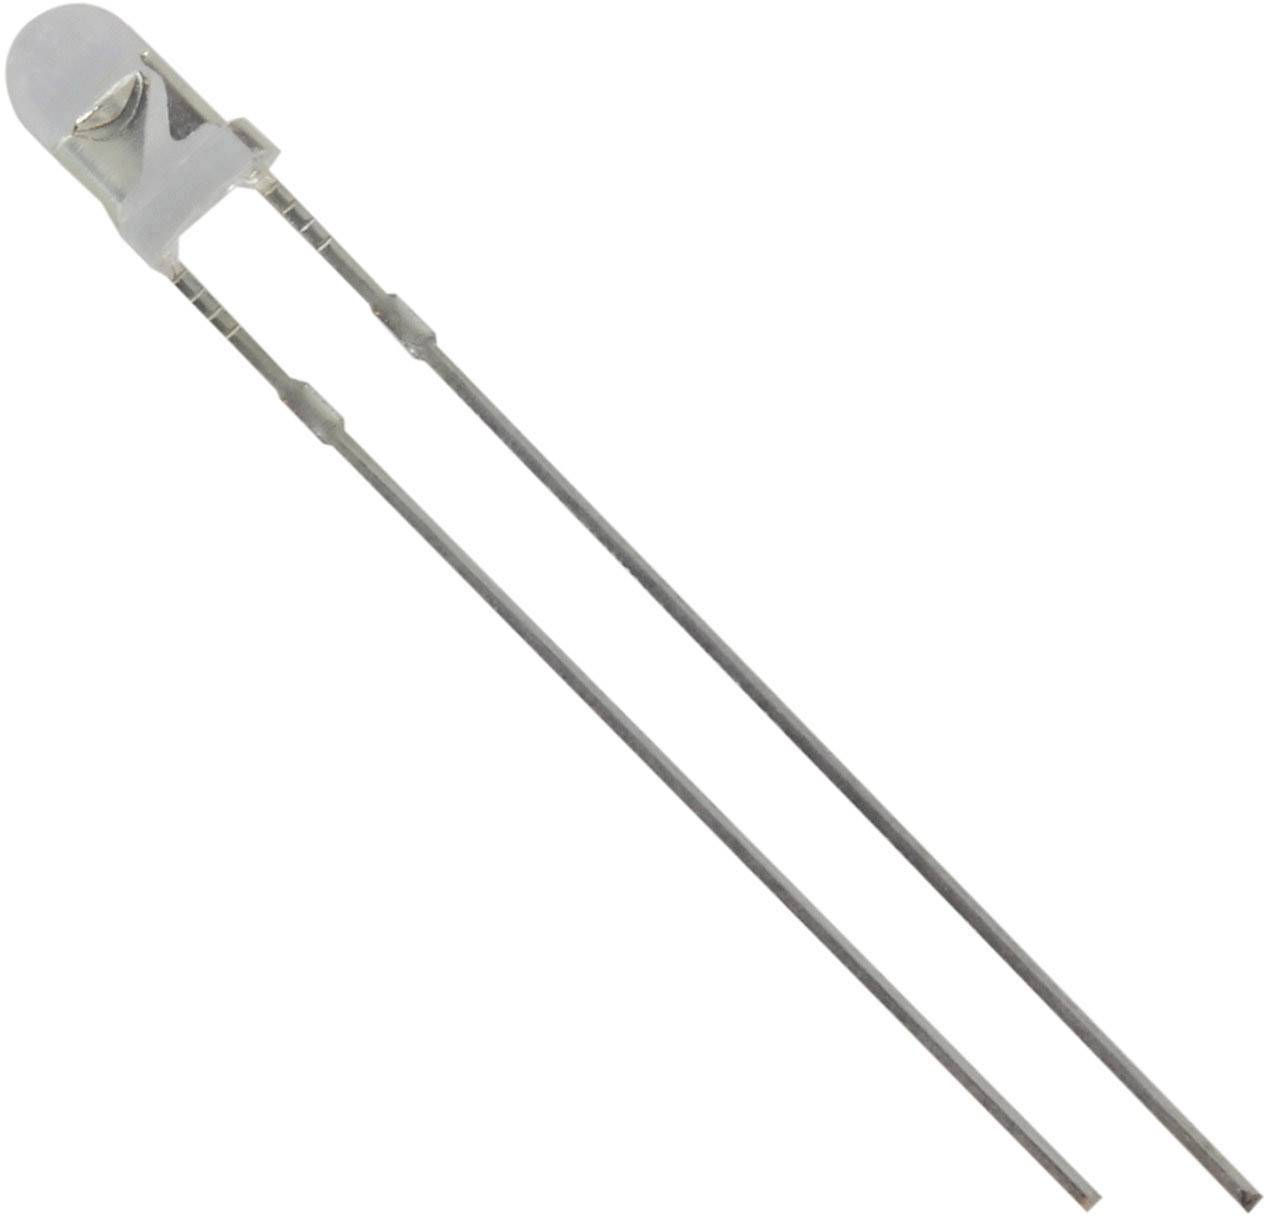 LED s vývody HuiYuan 3034W2C-DSE-C, typ čočky kulatý, 3 mm, 40 °, 20 mA, 5500 mcd, 3.1 V, bílá